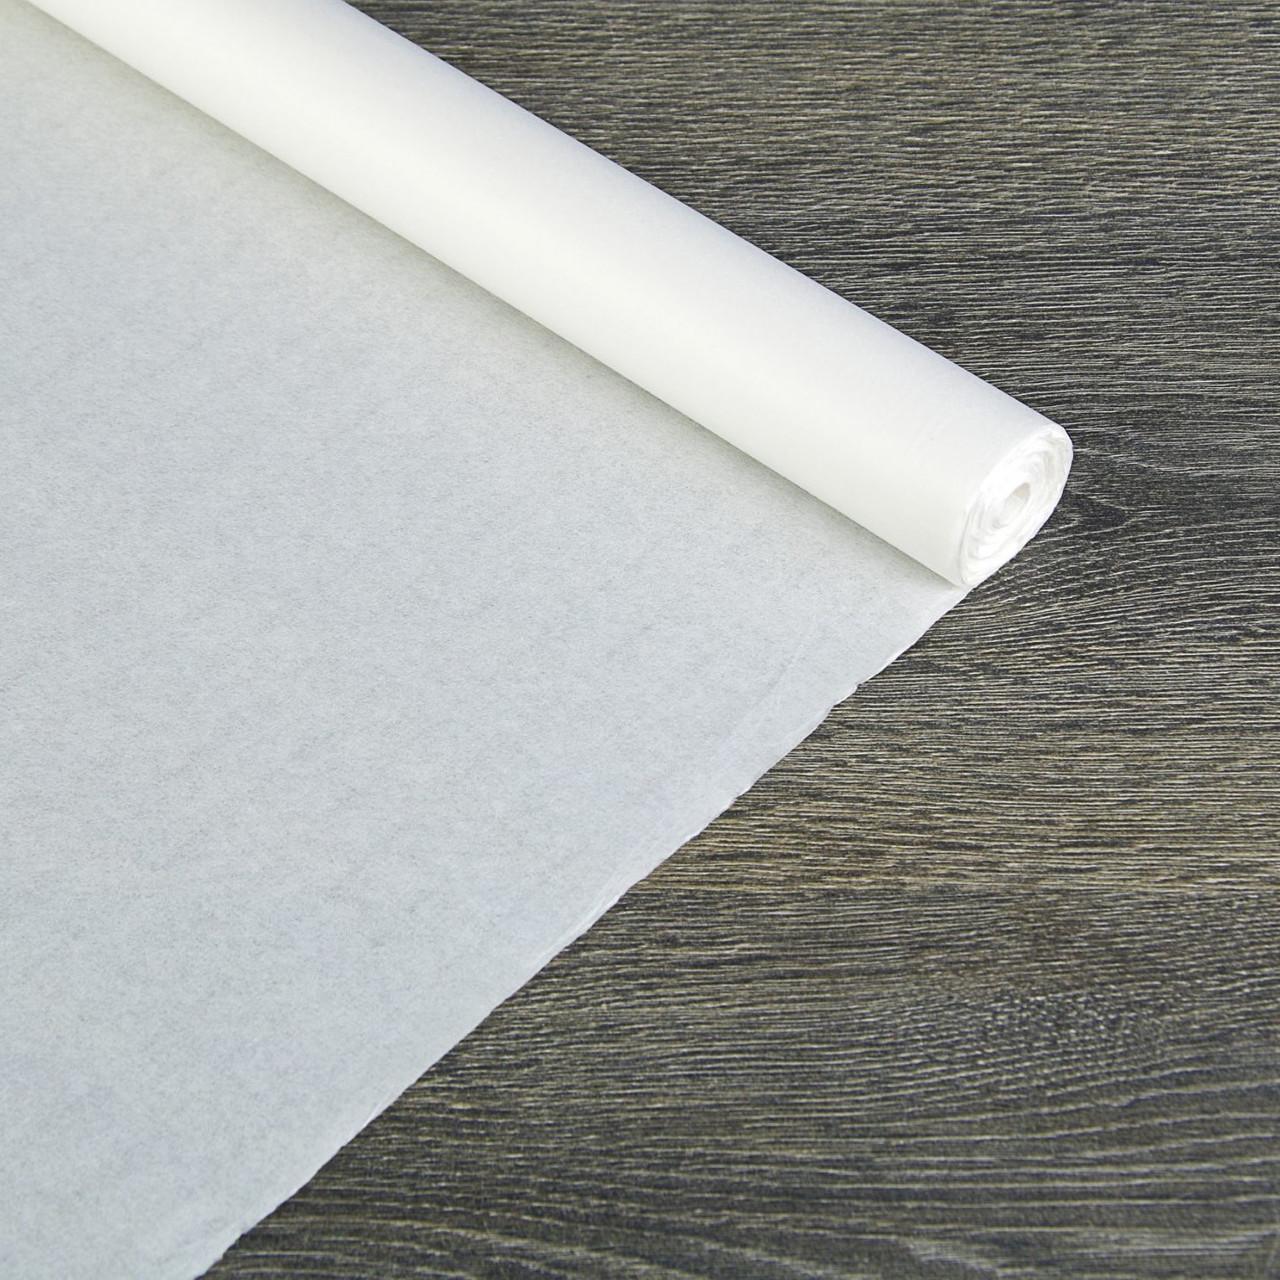 Бумага рисовая ширина — 970 мм, длина рулона — 10 м, 35 г/м²